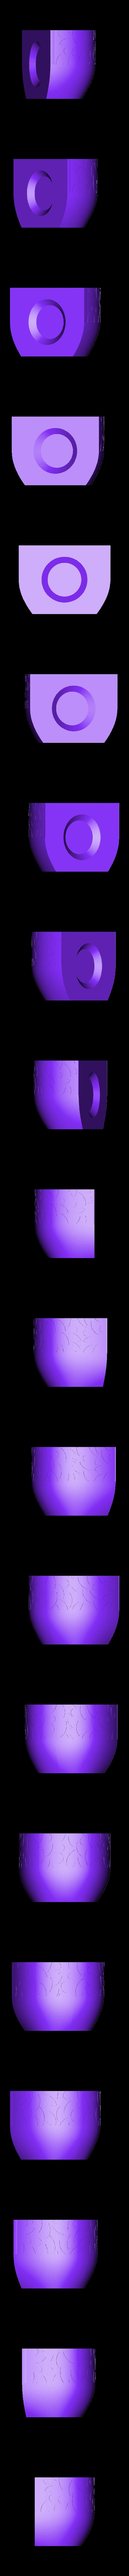 LM_ballfleur.stl Download STL file Luminaires • Design to 3D print, Barbe_Iturique